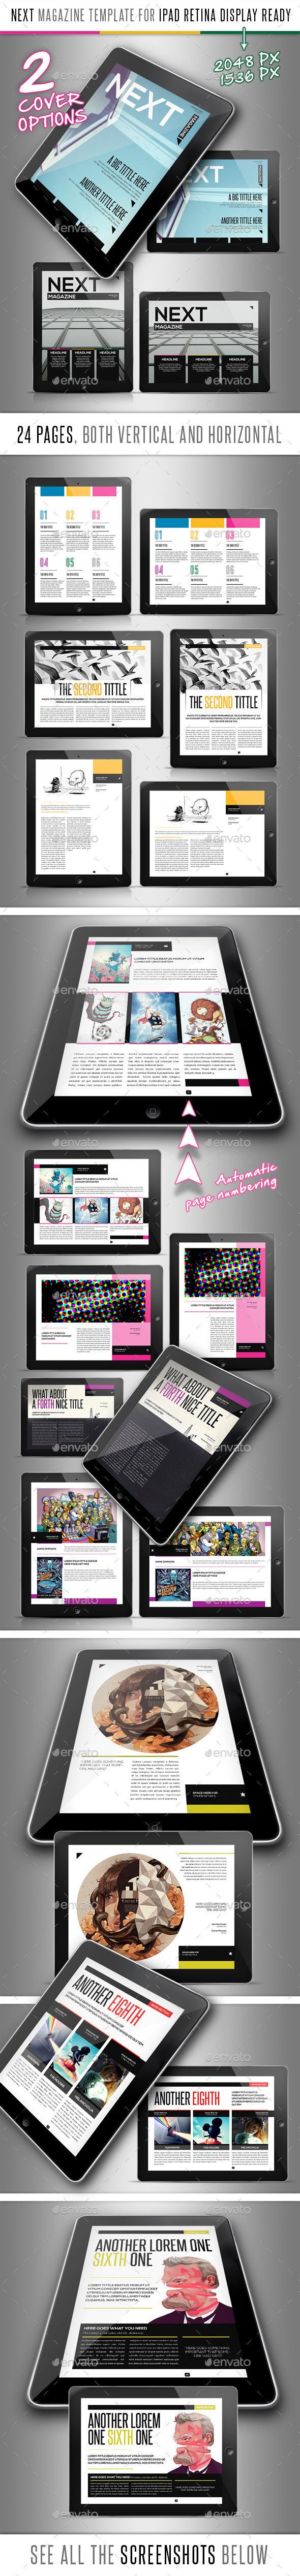 Next Magazine for Tablet Indesign Template - Digital Magazines ePublishing